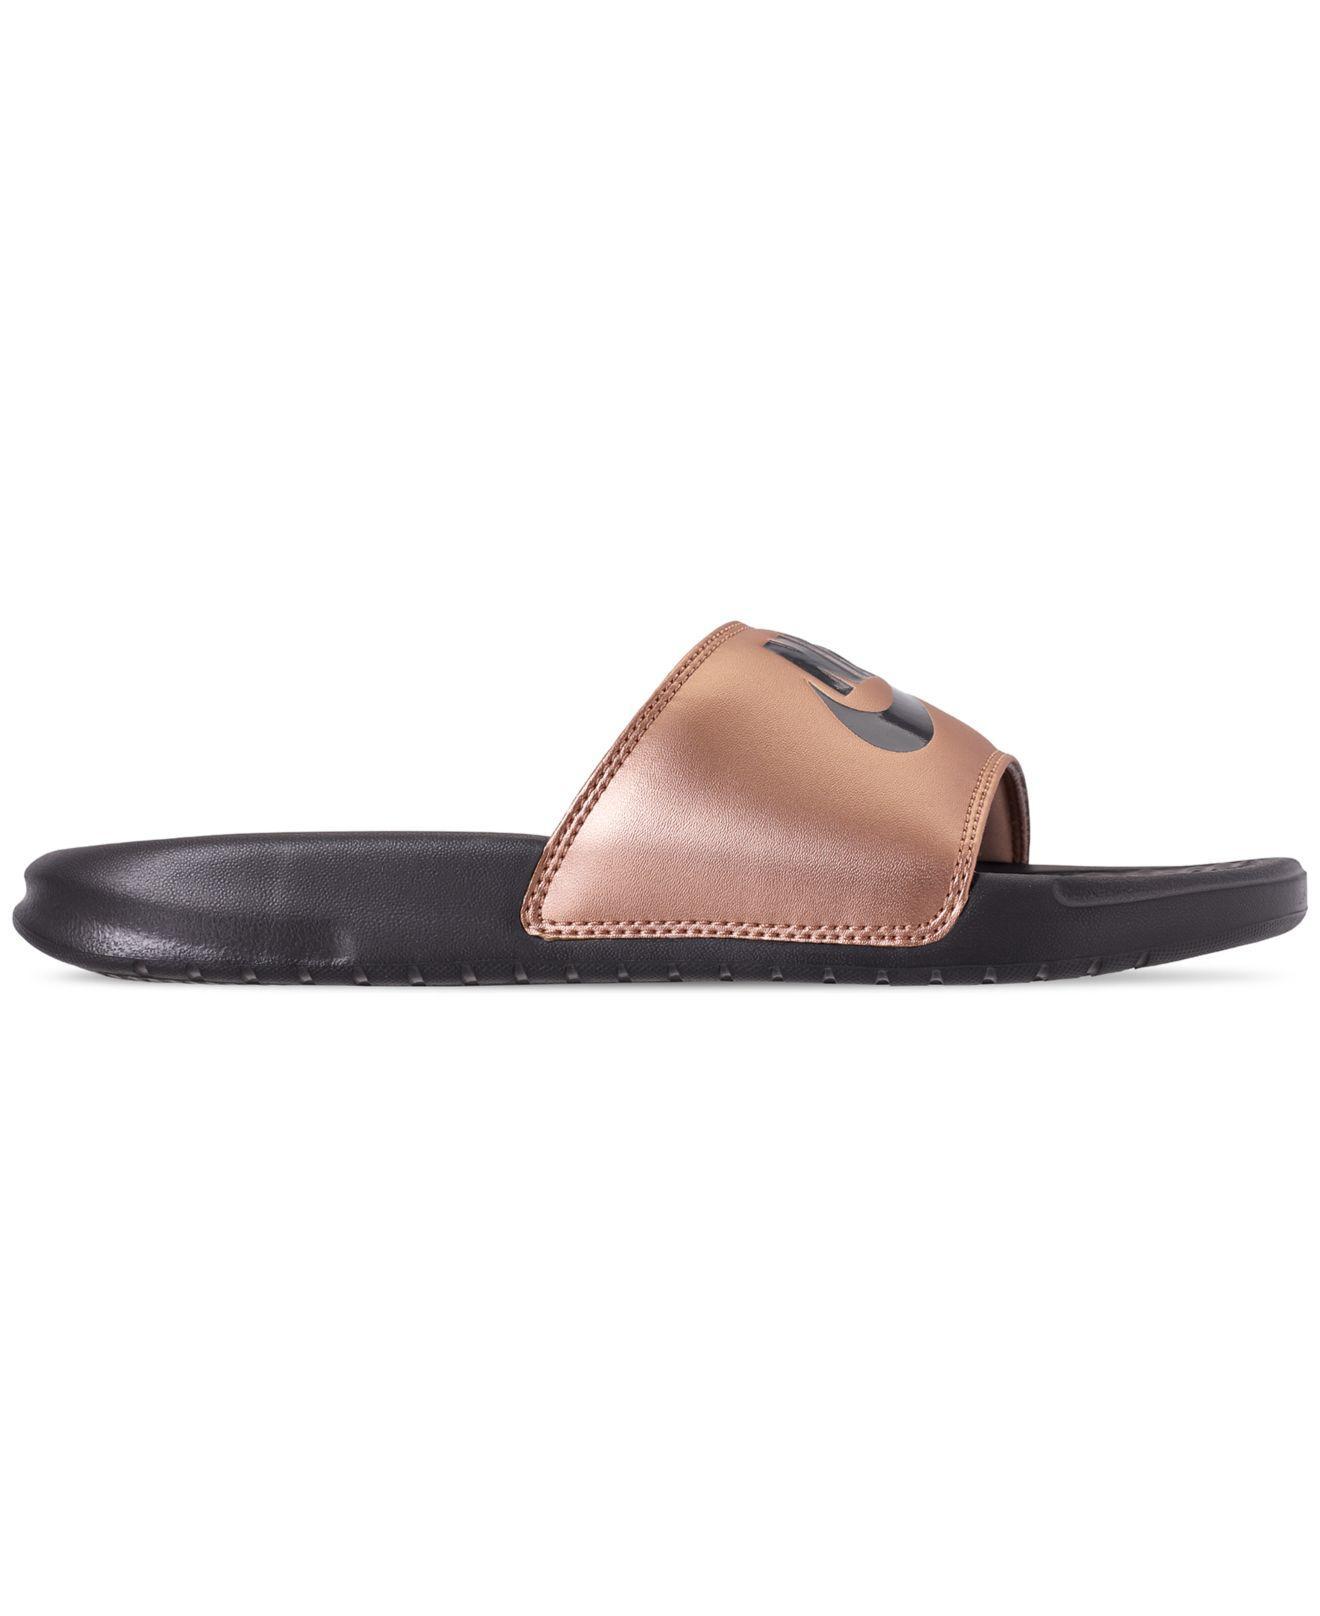 53c7839acf1ce Lyst - Nike Benassi Jdi Swoosh Slide Sandals From Finish Line - Save 14%